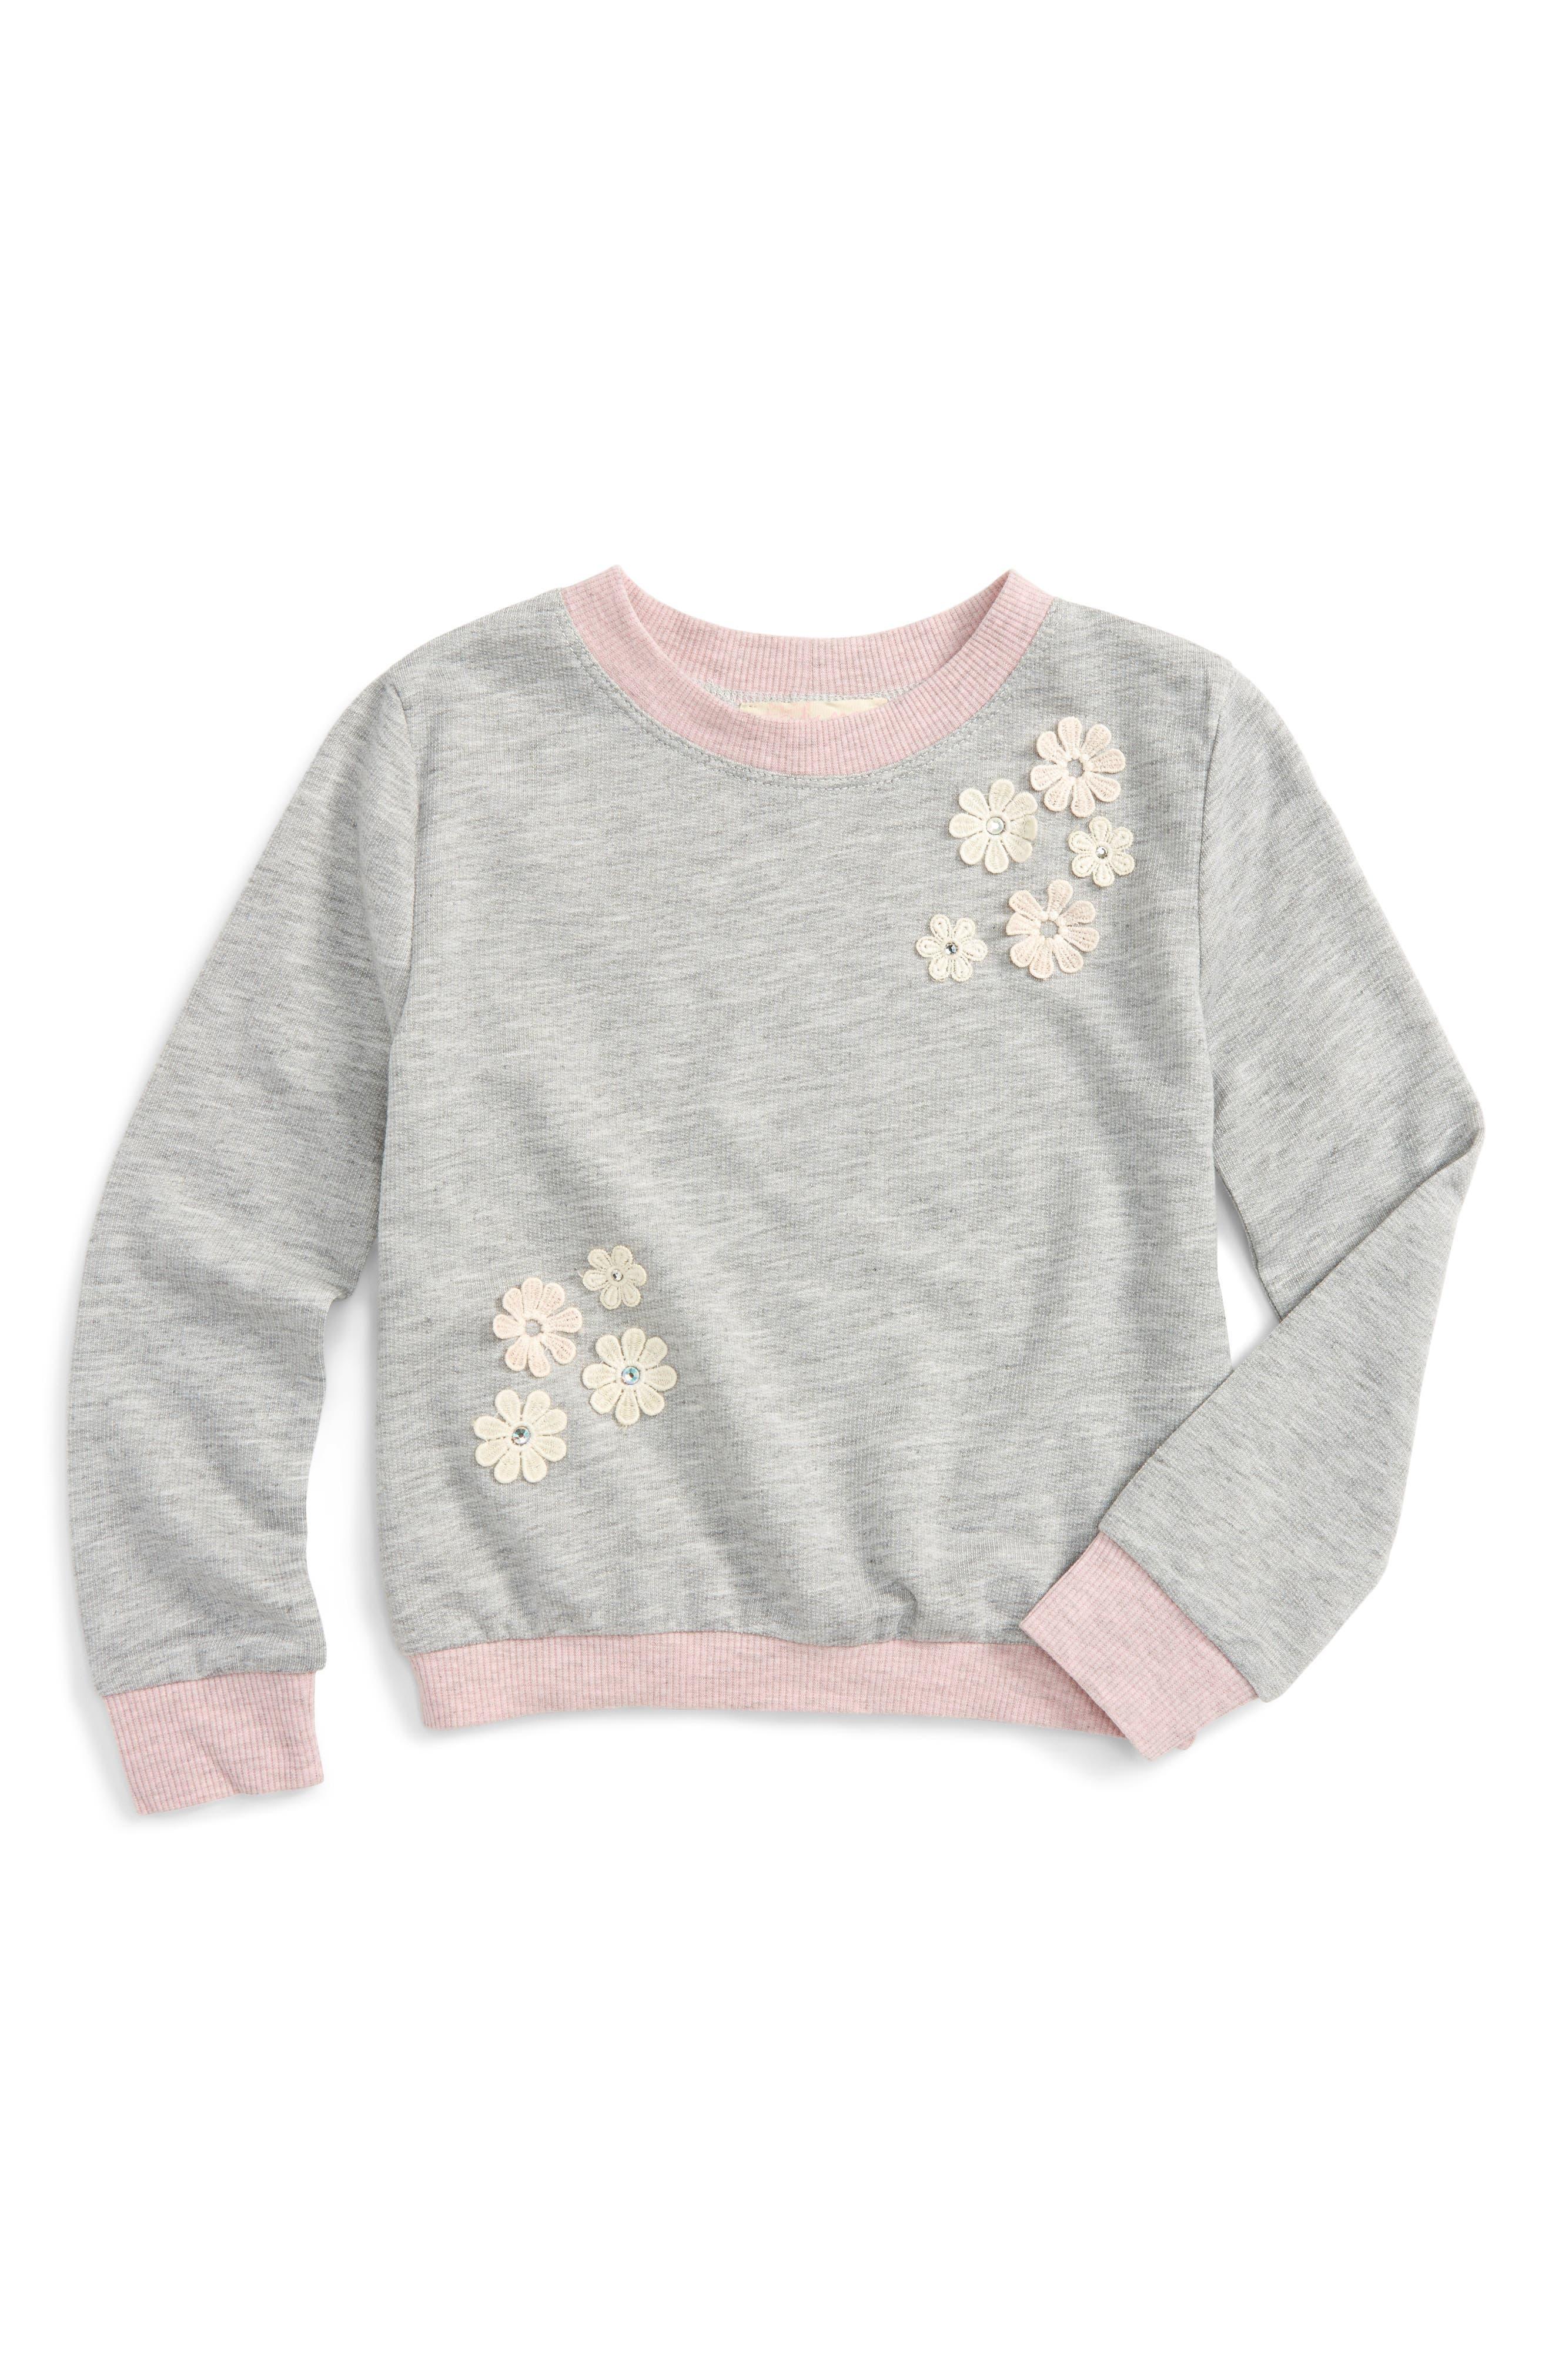 Alternate Image 1 Selected - Truly Me Floral Appliqué Sweatshirt (Toddler Girls & Little Girls)